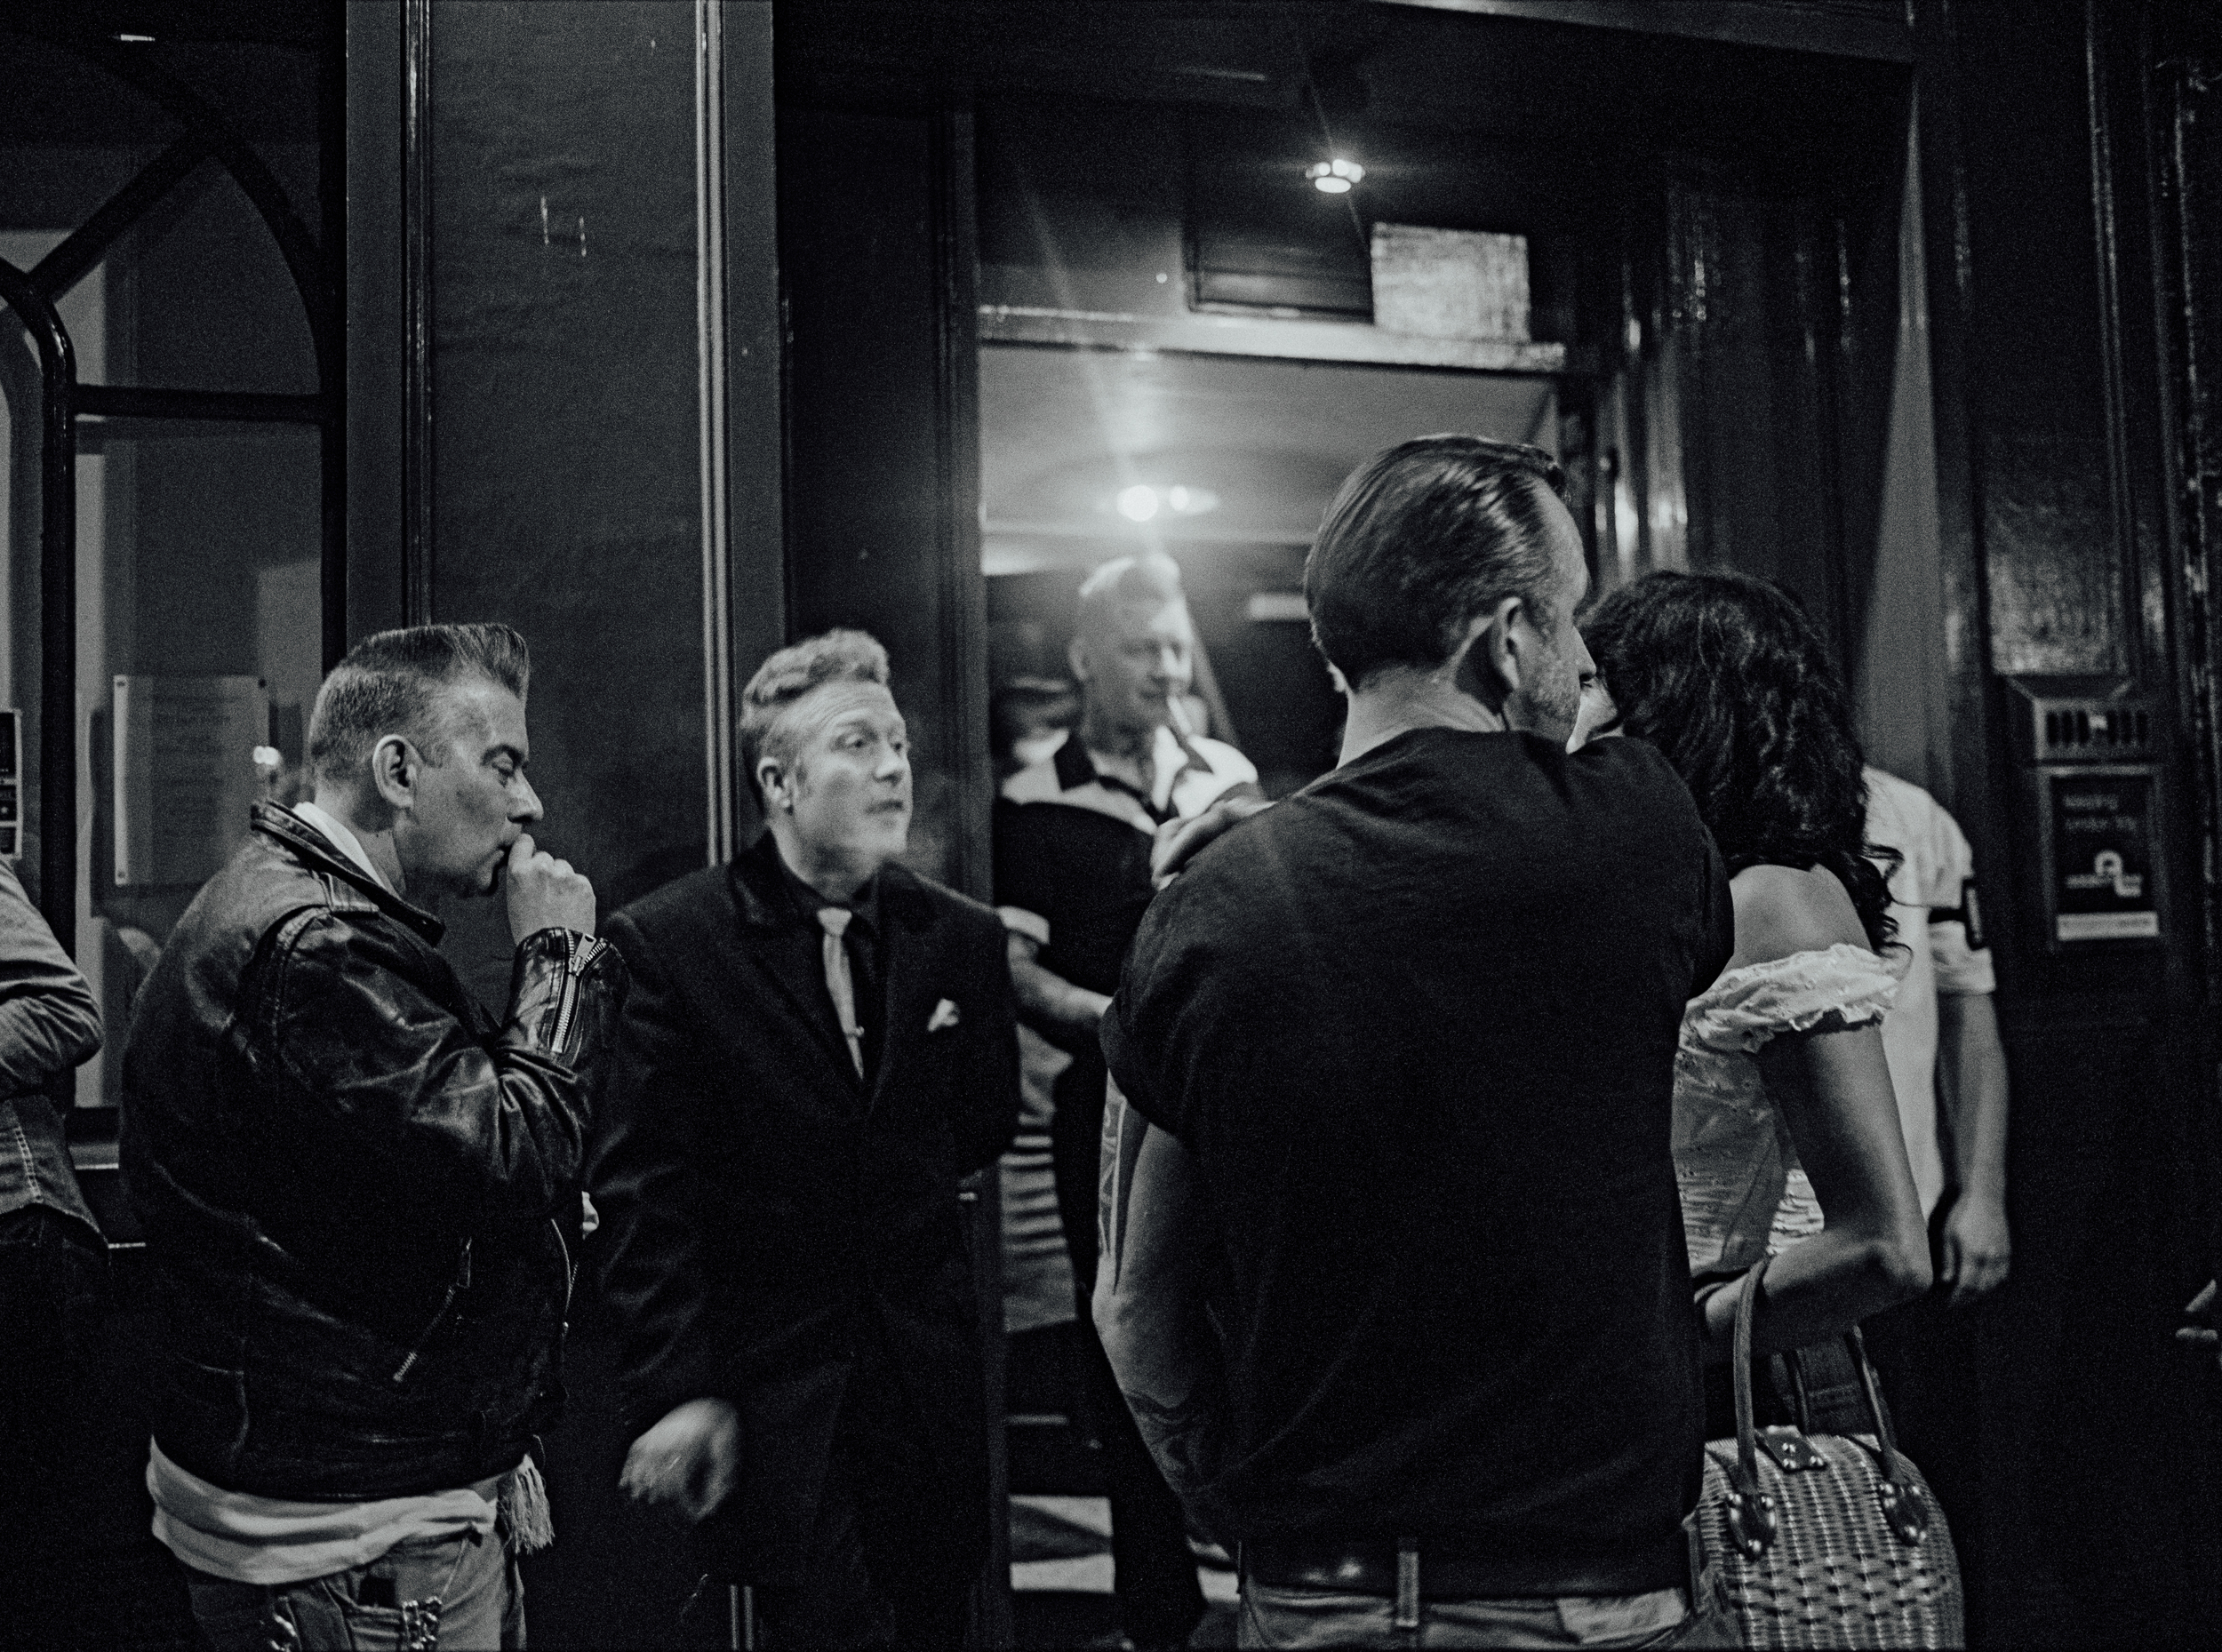 Smokers outside Virginia Creepers, London 2007